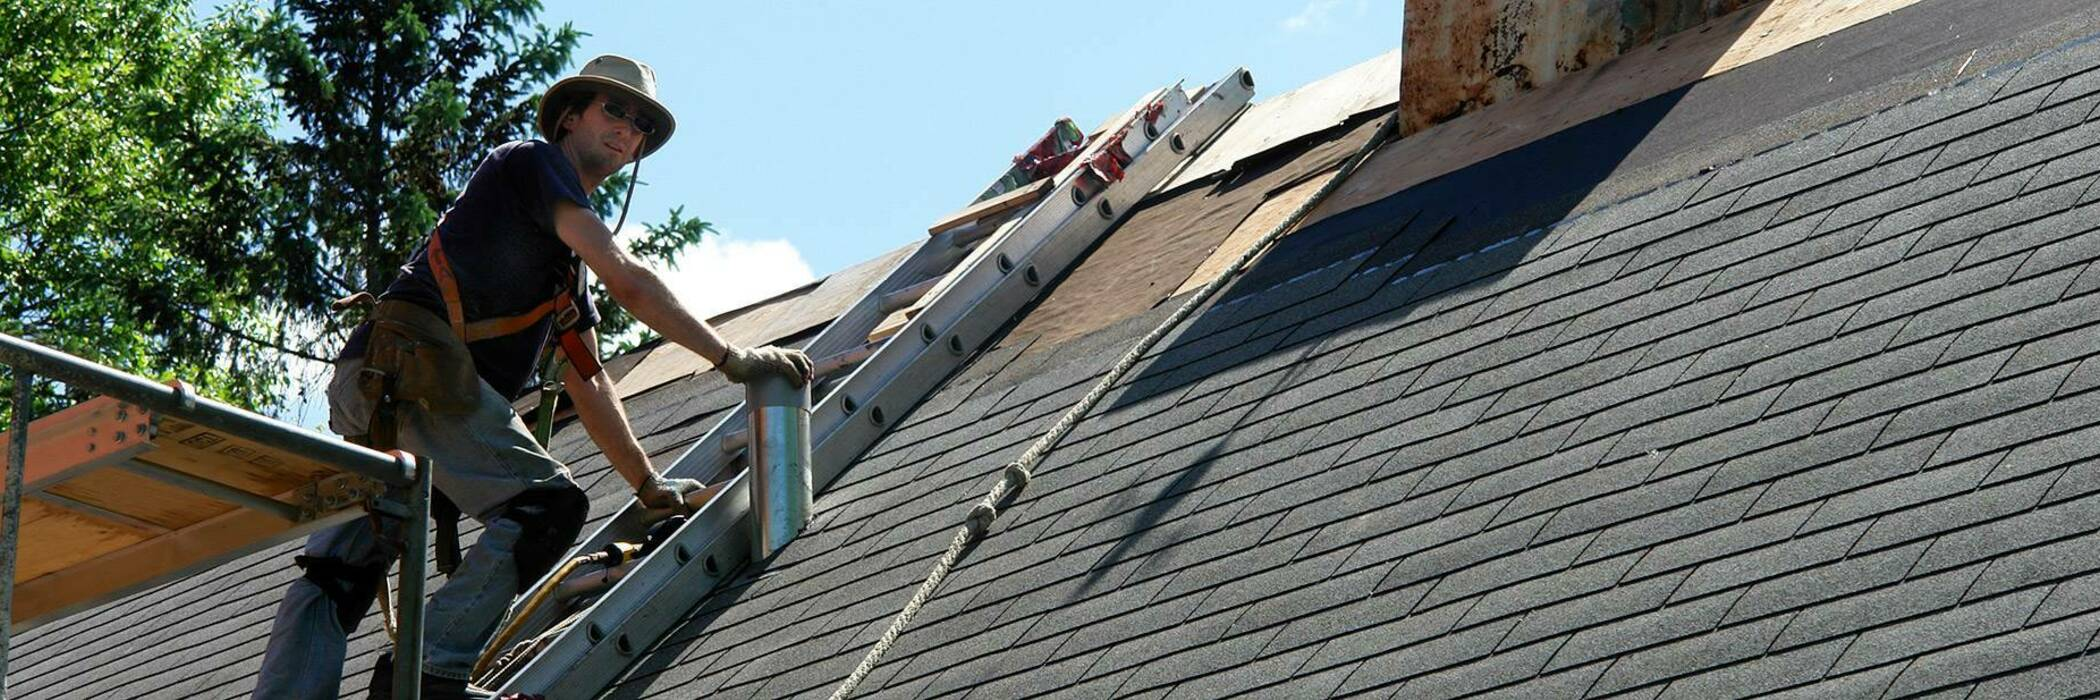 General roof maintenance hero